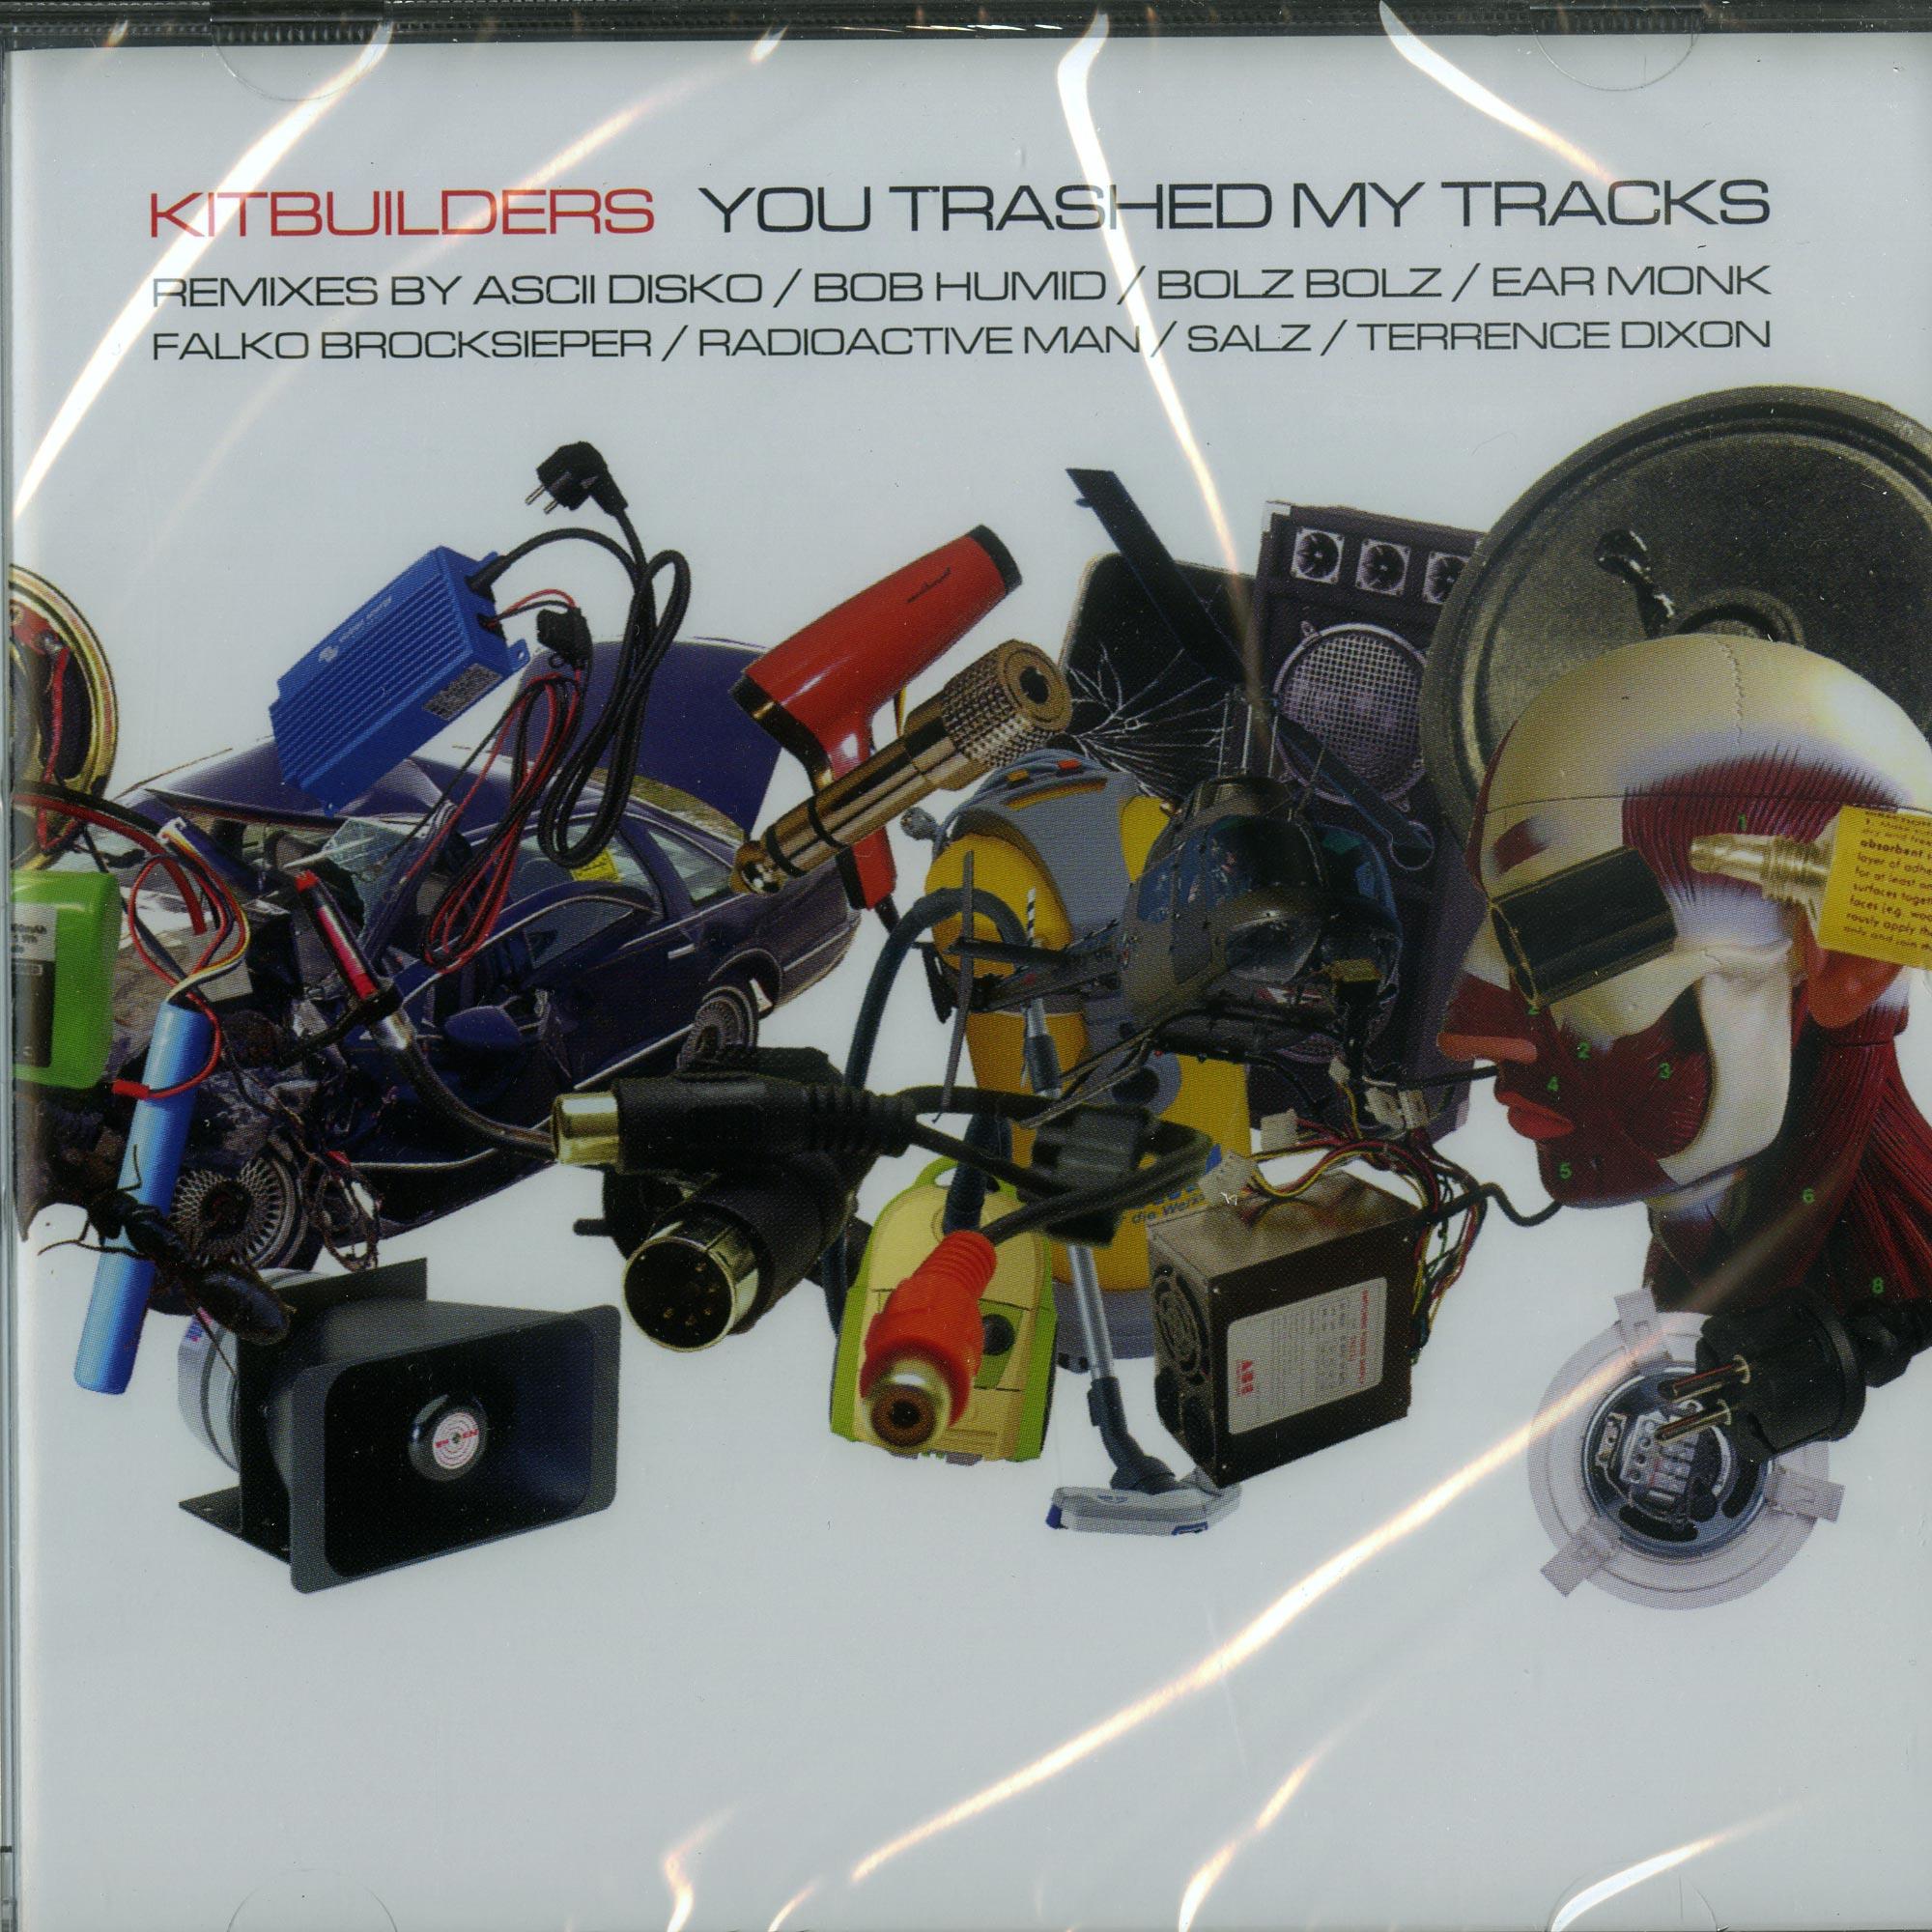 Kitbuilders - YOU TRASHED MY TRACKS